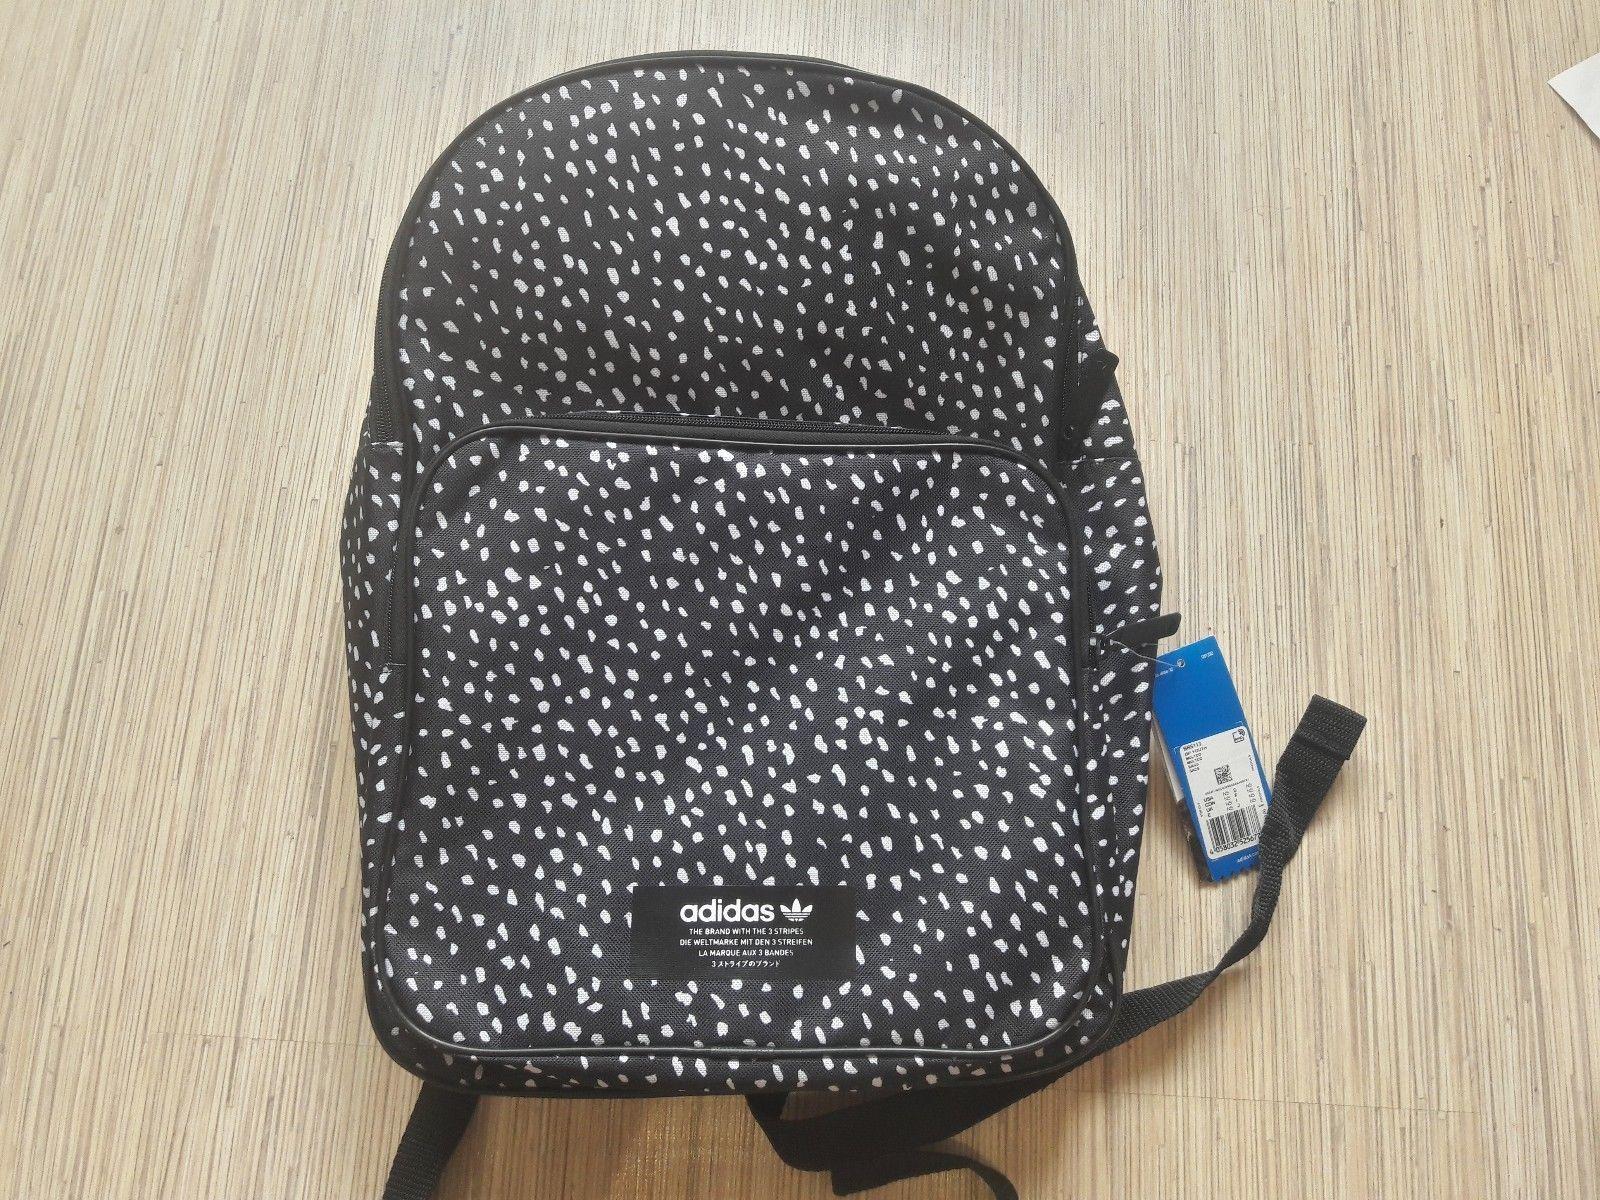 Adidas Originals POLKA-DOT-PRINT Backpack  BR5113 image 3